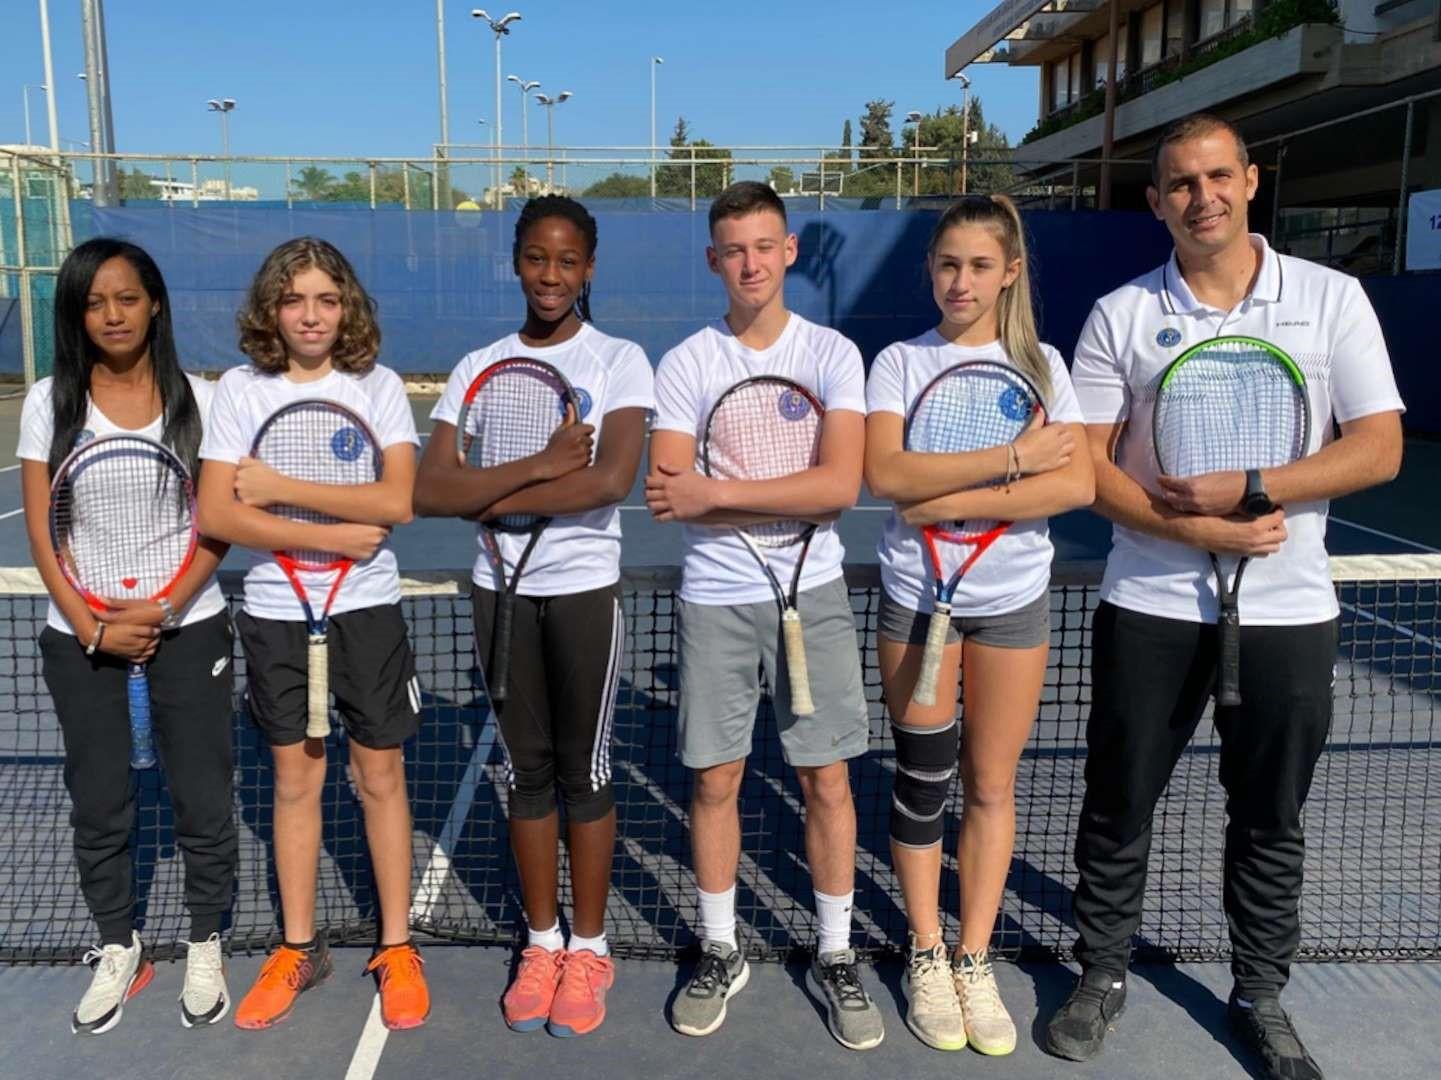 israeli-tennis-centers